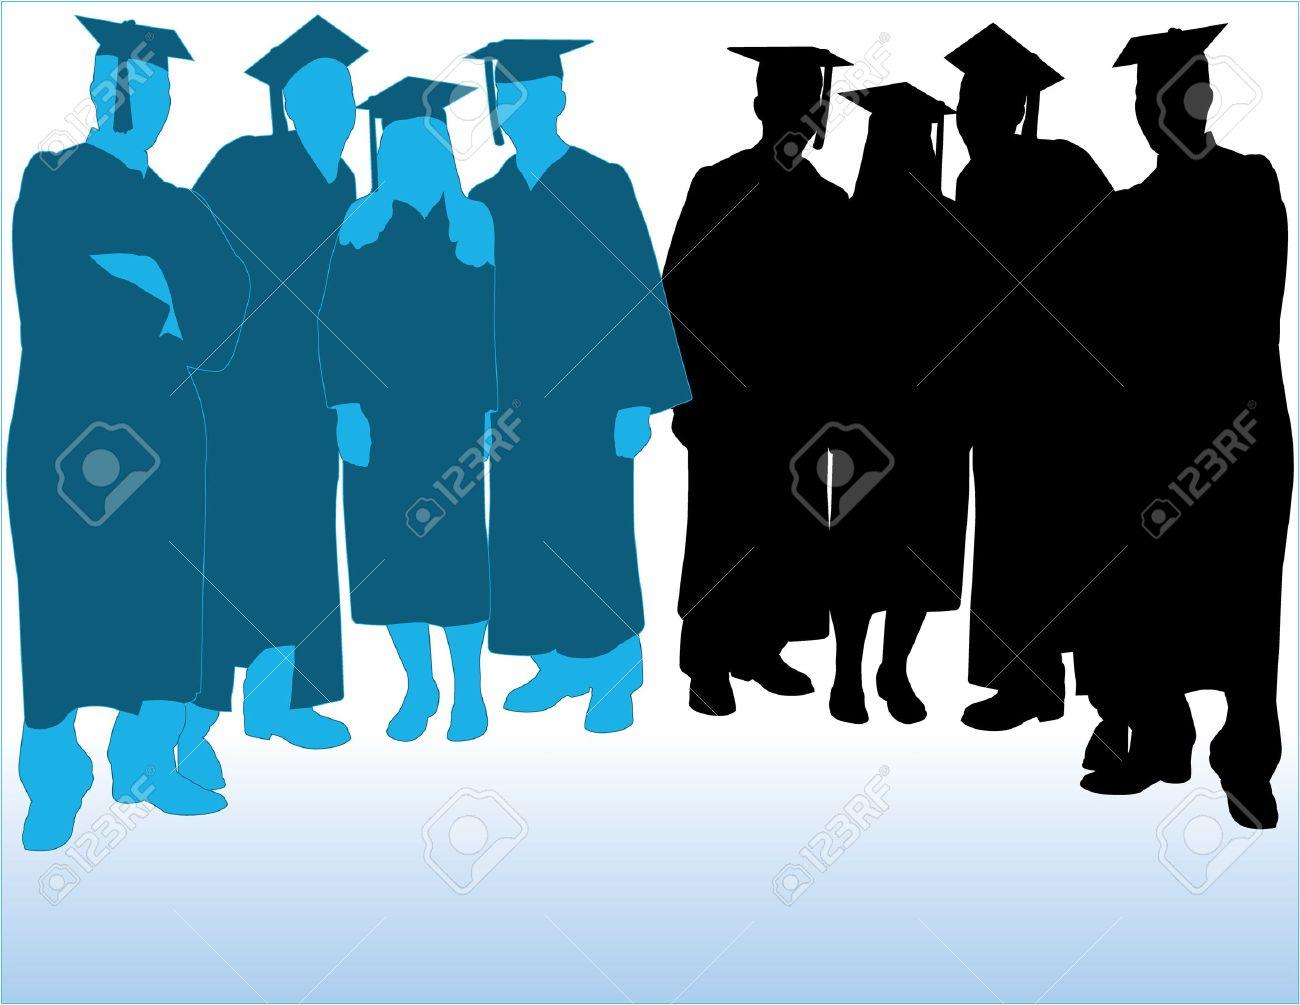 Graduates Vector Silhouettes Stock Vector - 11840083